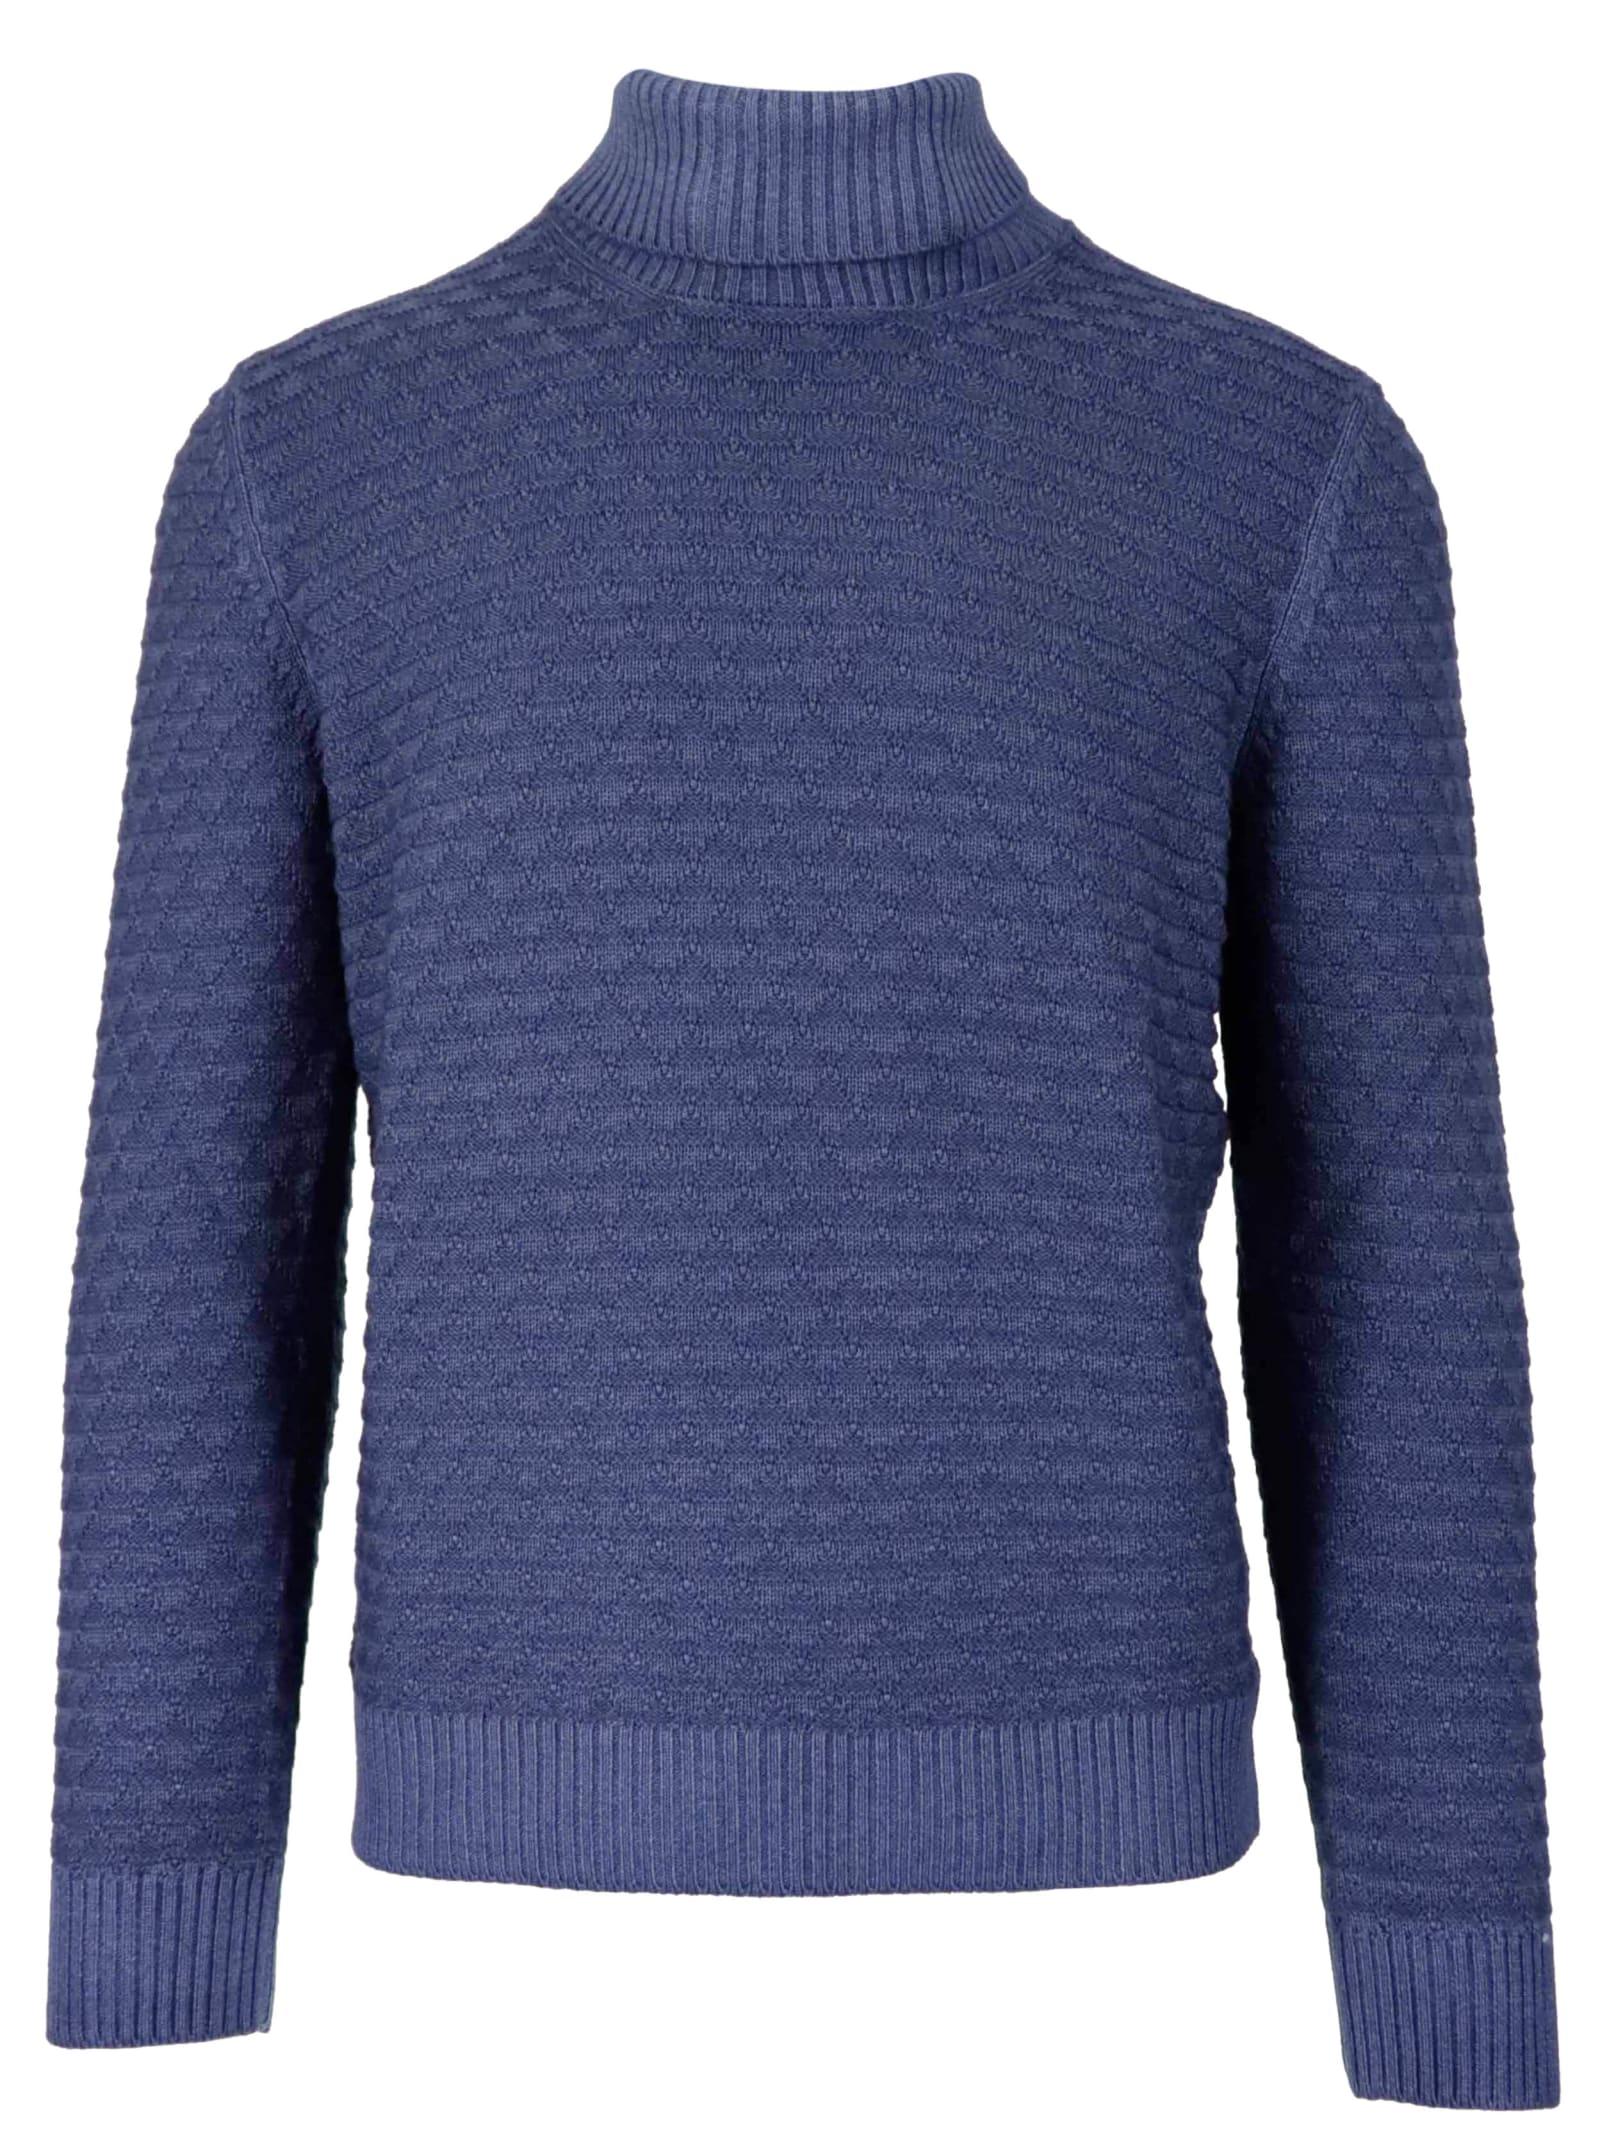 Gran Sasso 100% Wool Top-wear